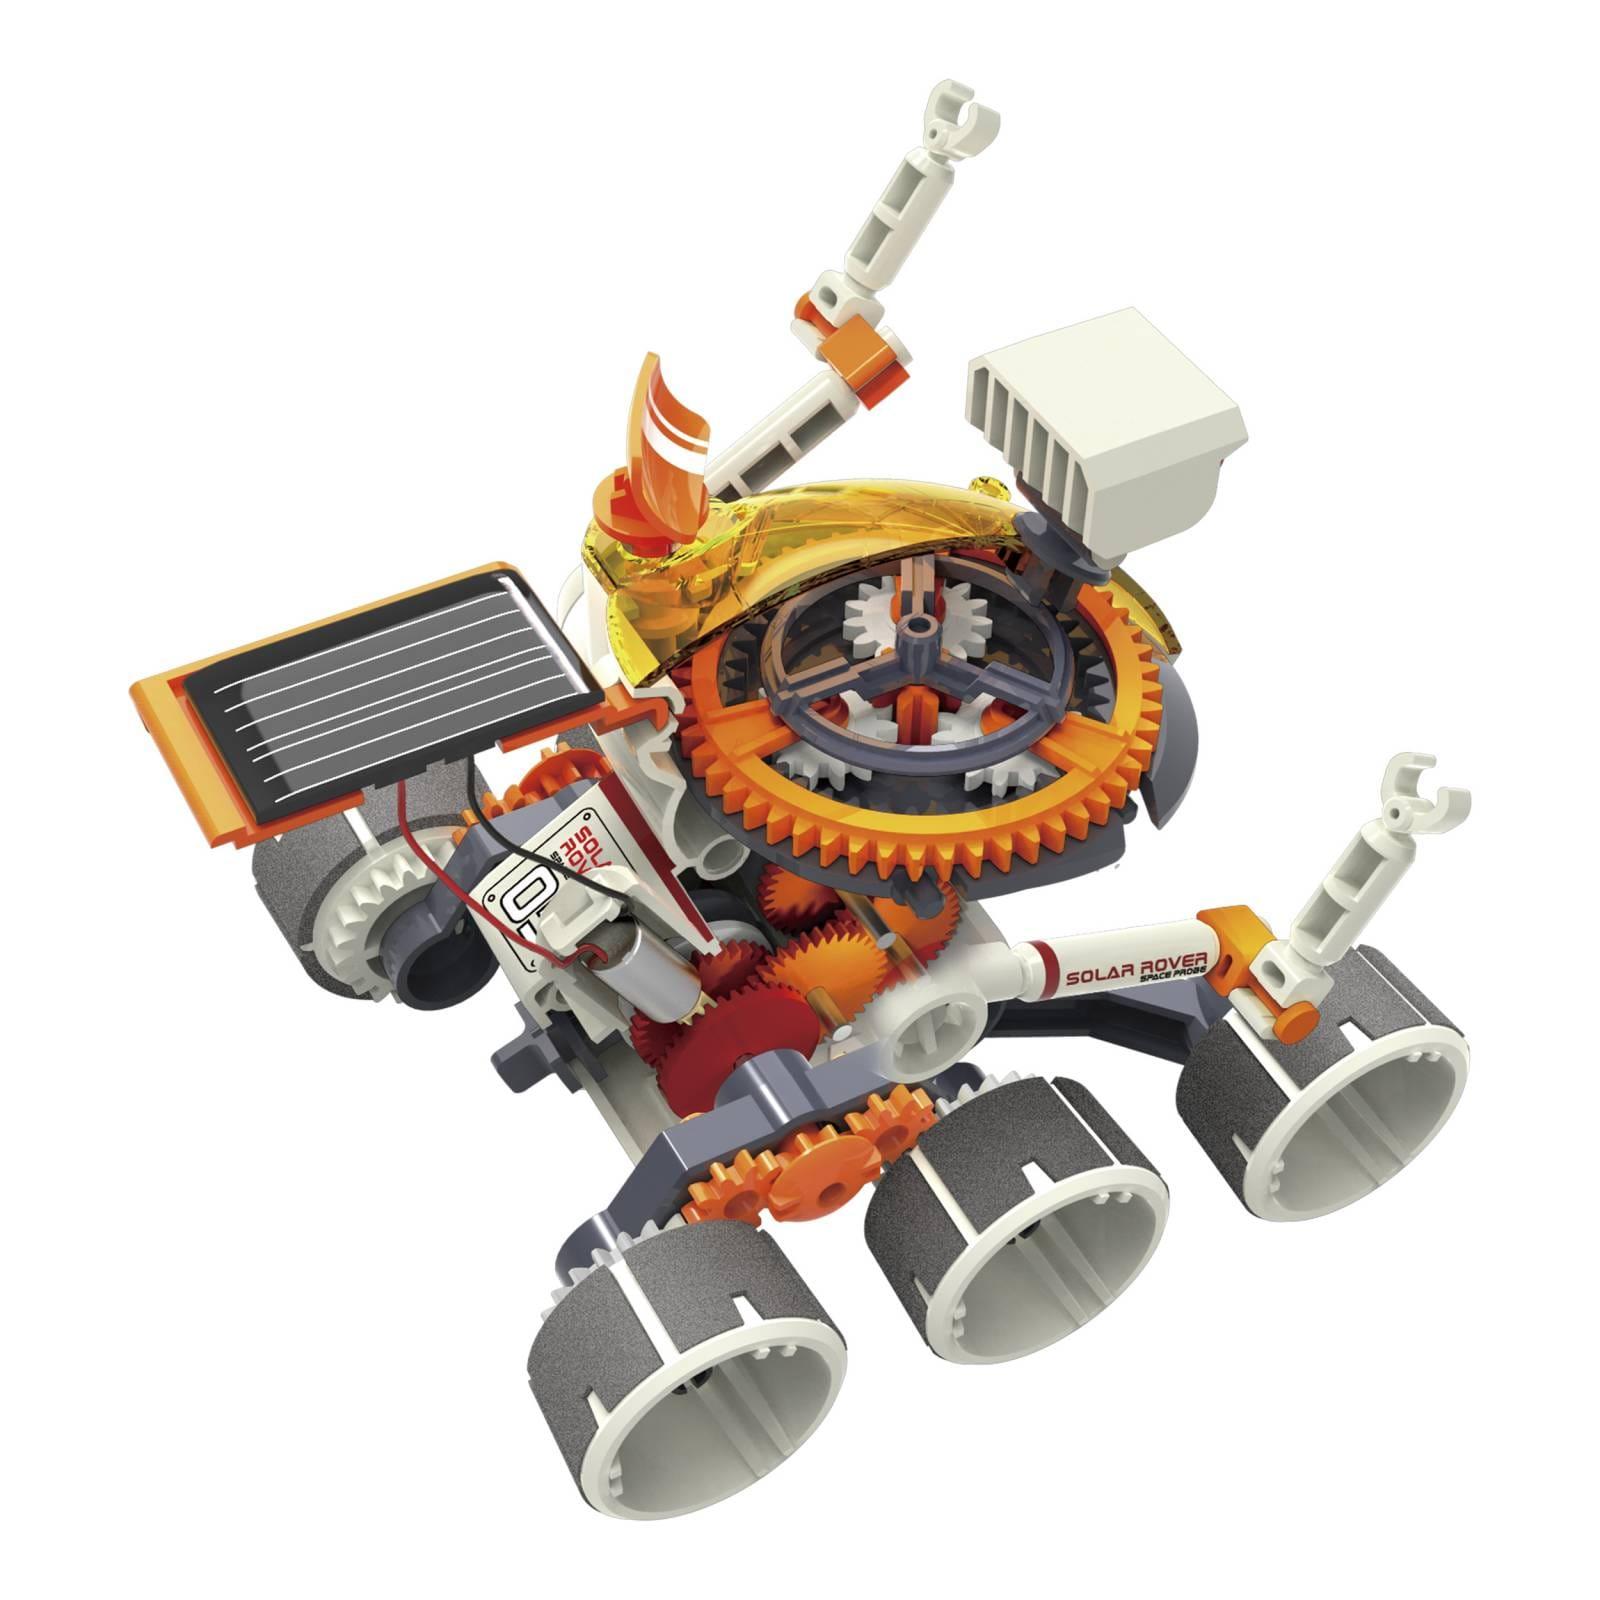 Kit solar explorador espacial